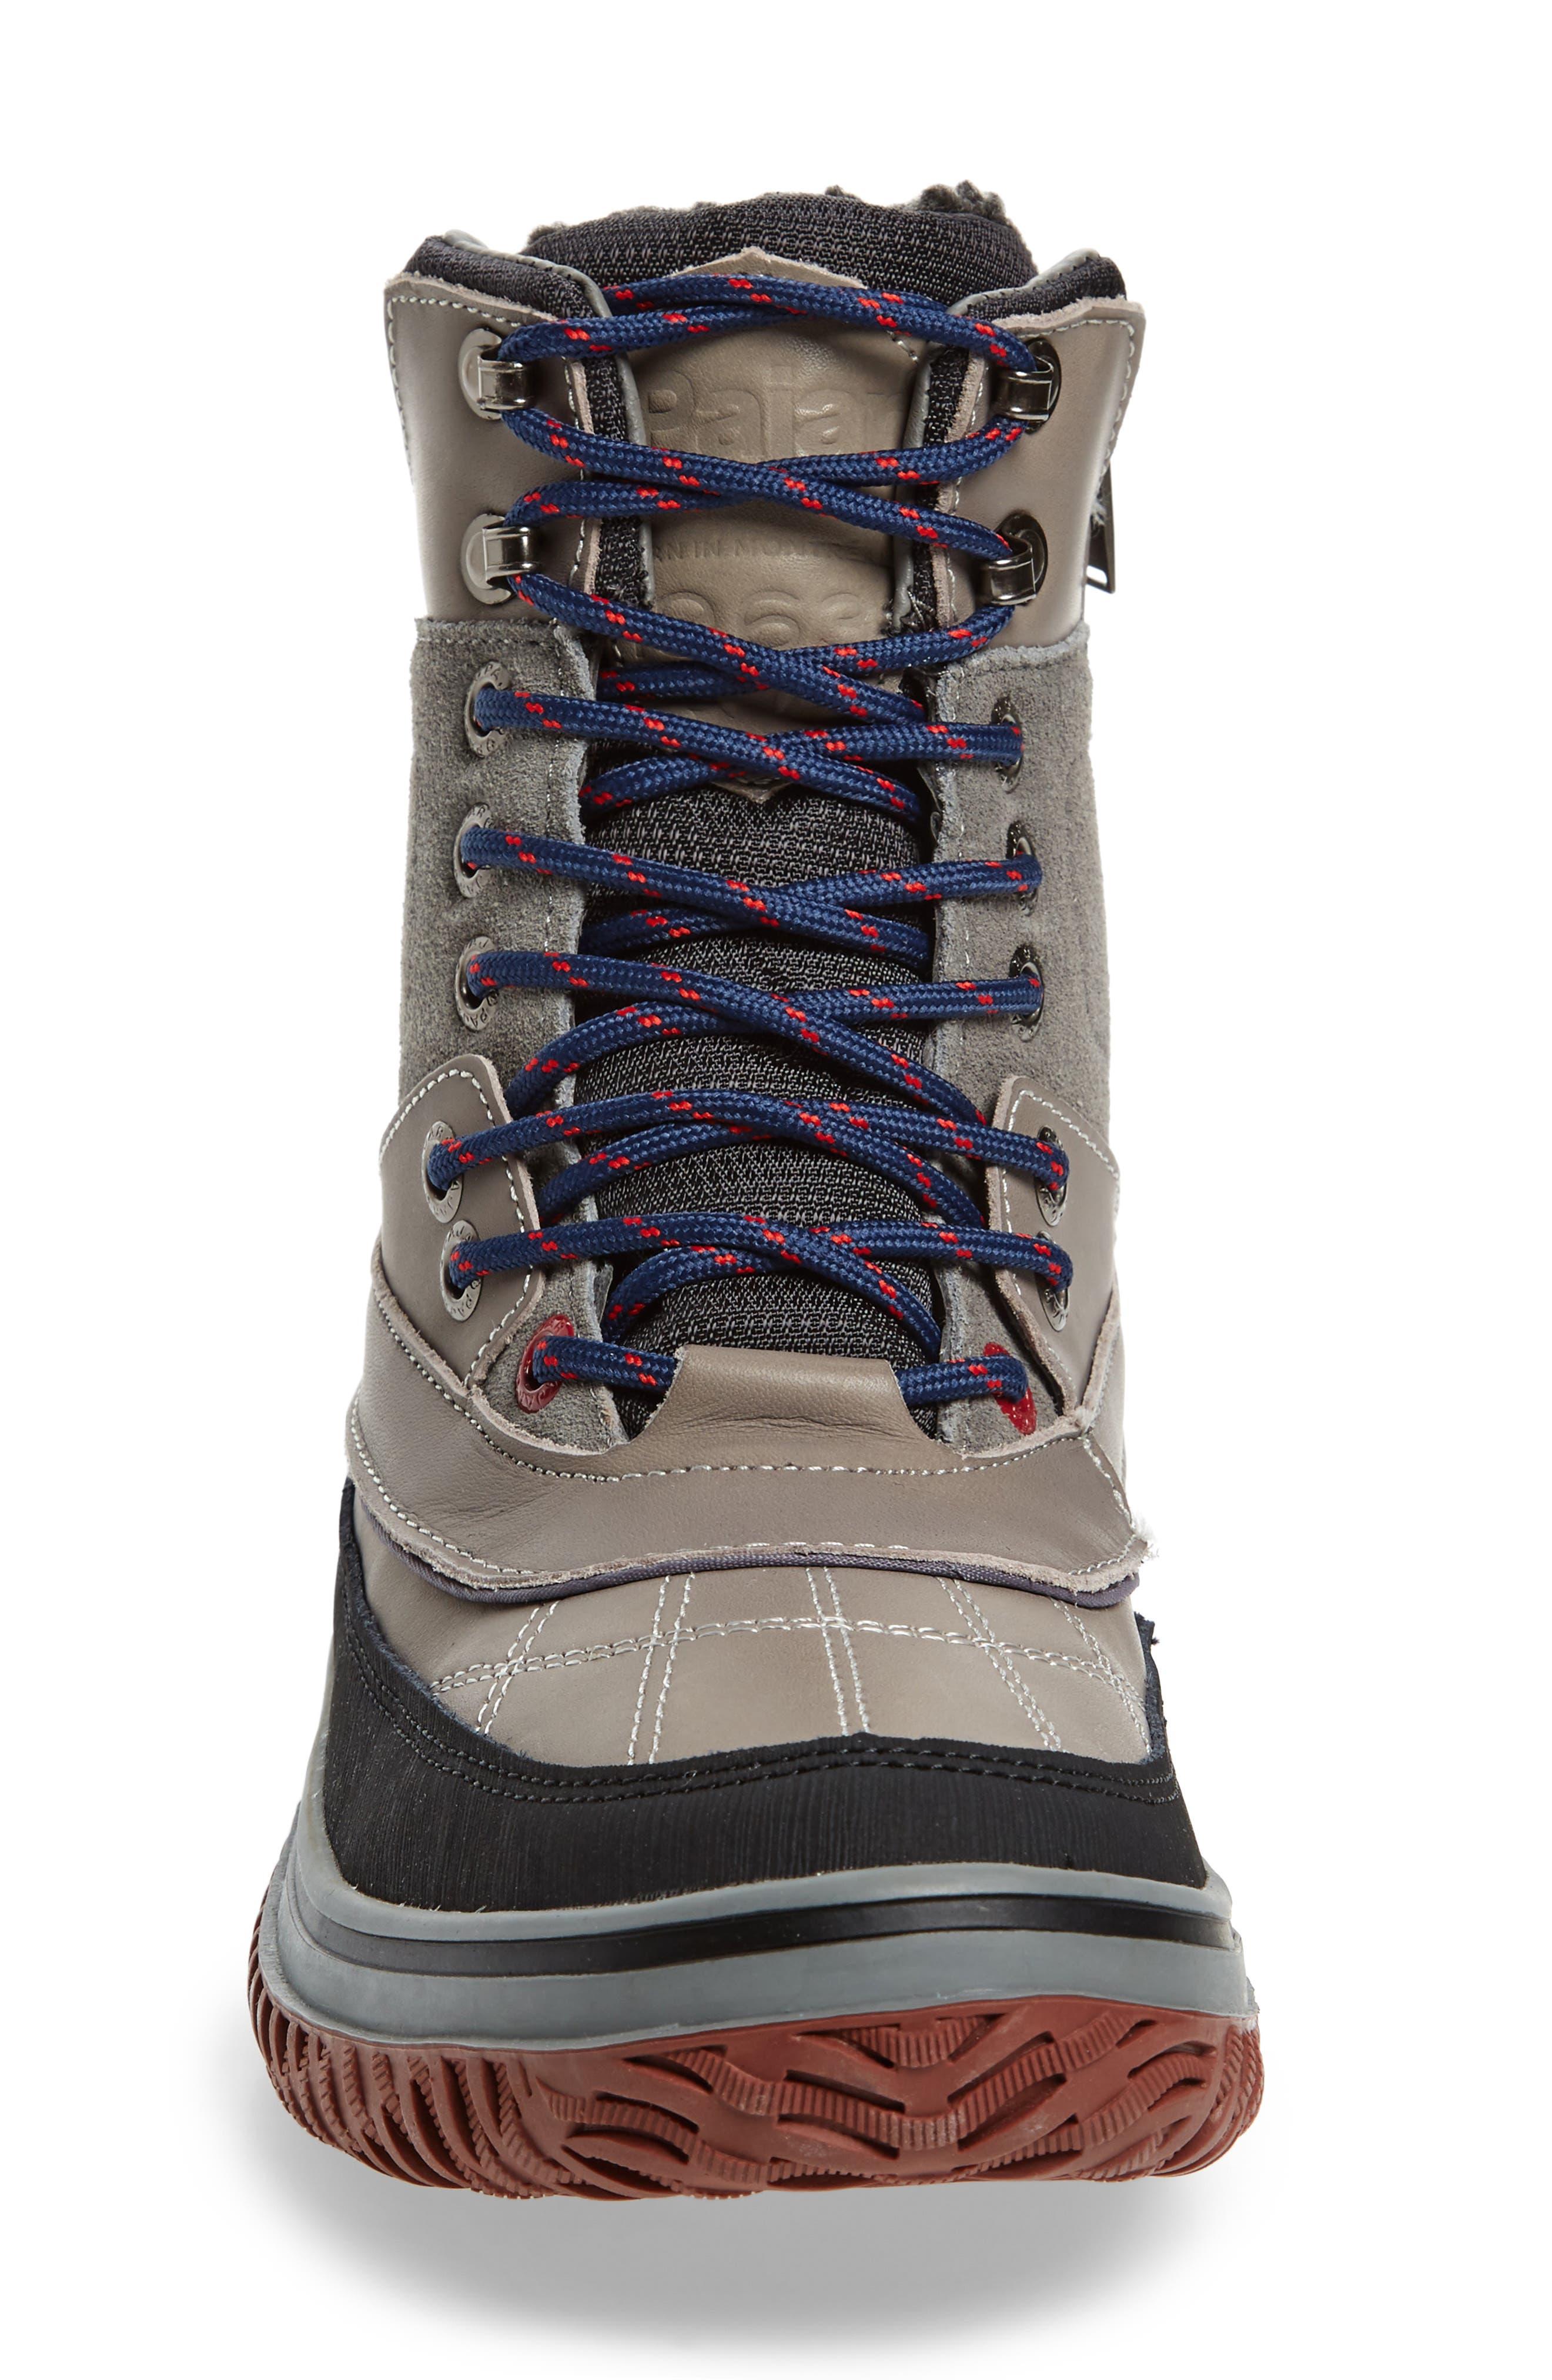 Gaspar Waterproof Winter Boot,                             Alternate thumbnail 4, color,                             Grey Leather